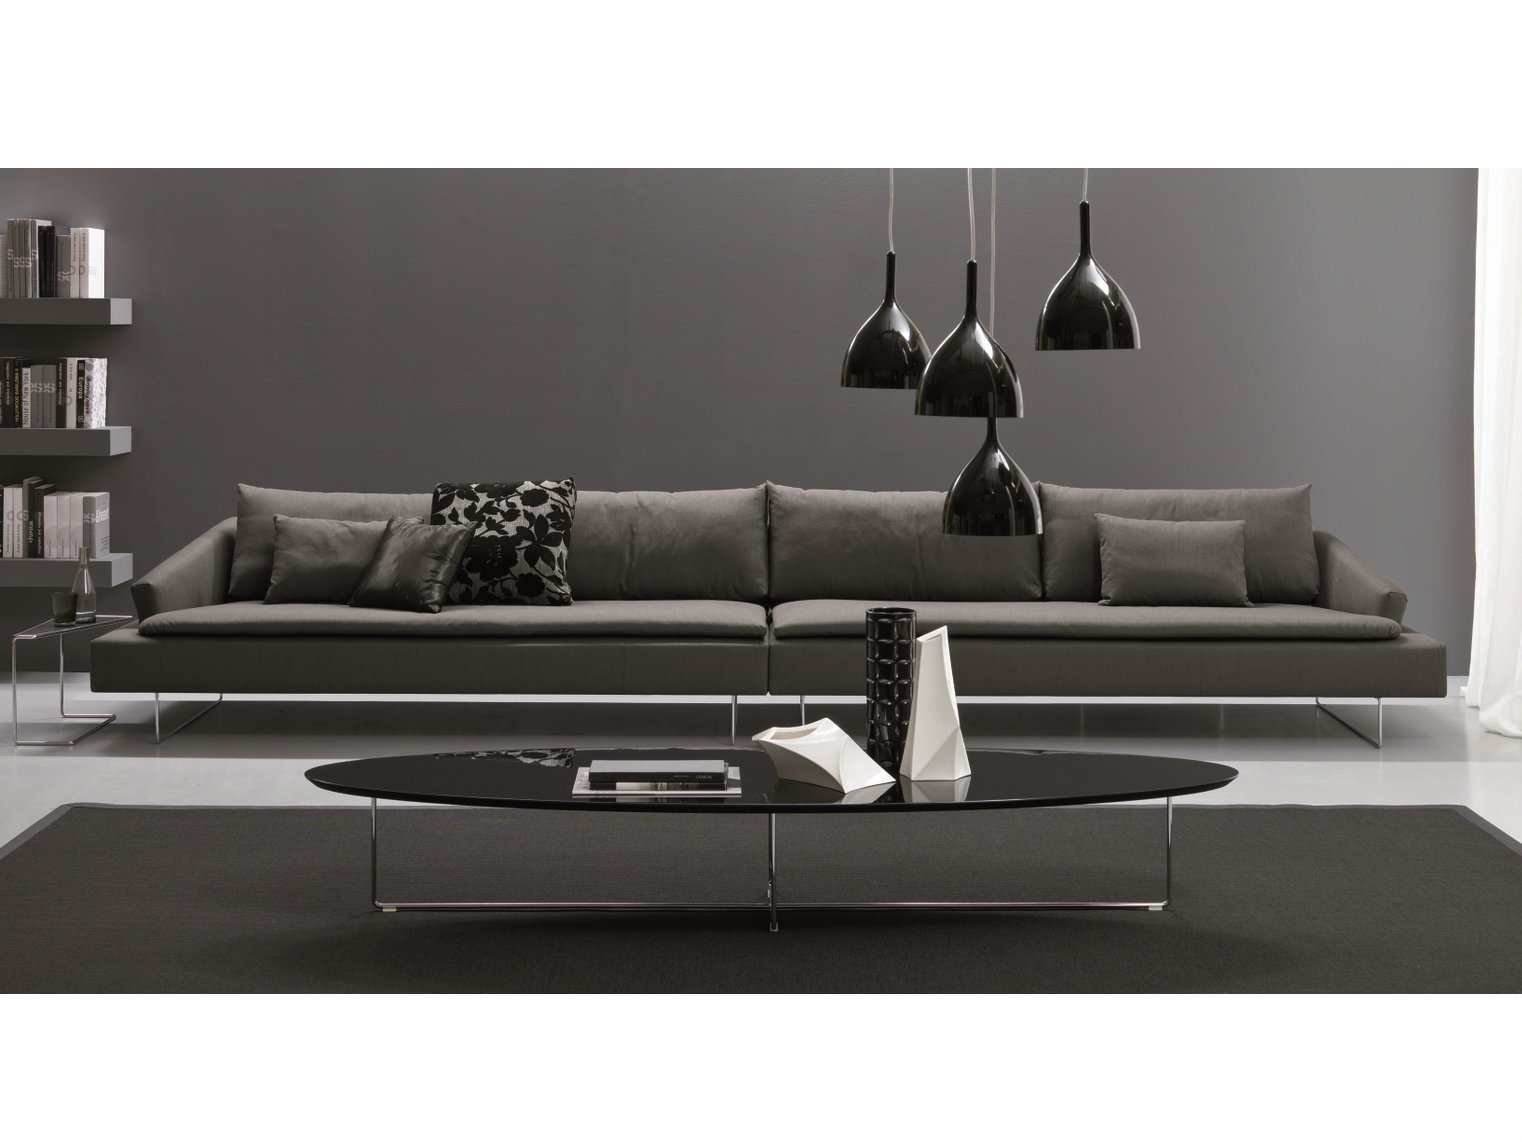 Itaca 6 seater sofa by bontempi casa design angelo natuzzi for Canape natuzzi